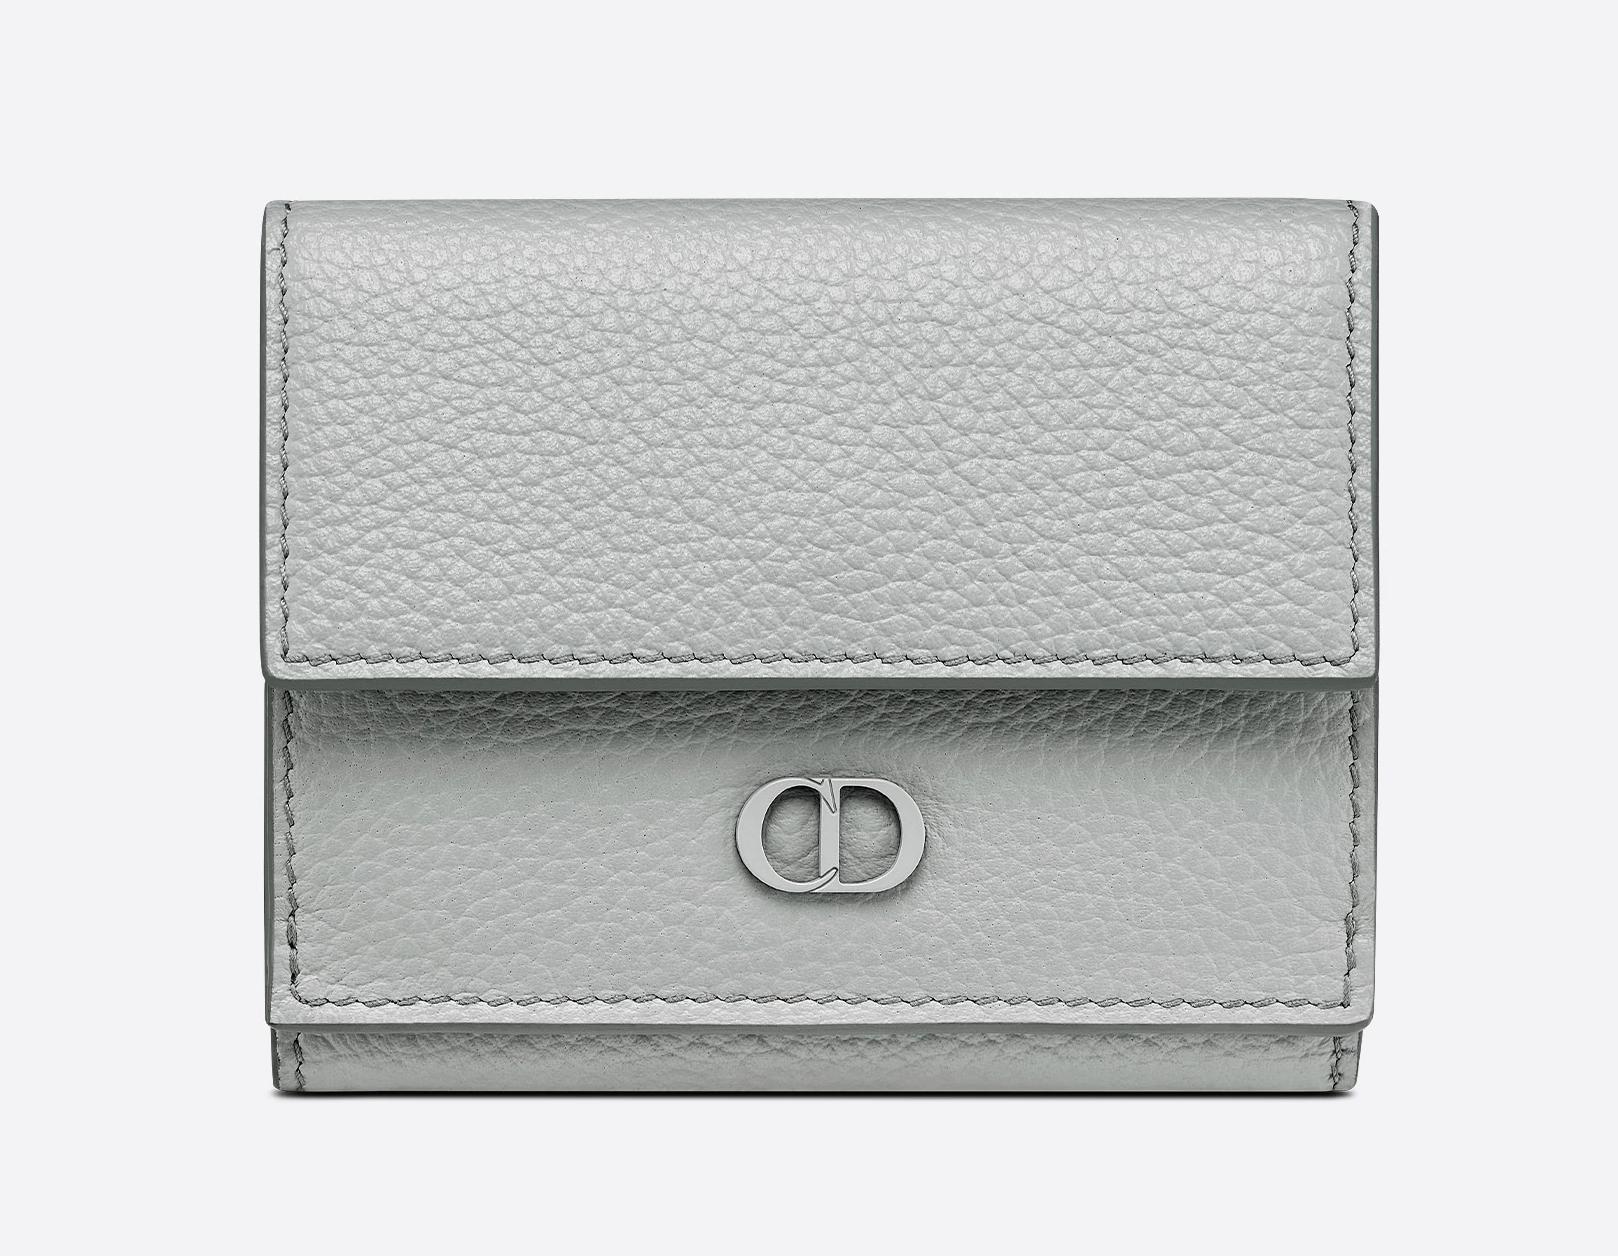 Dior 三摺錢包,建議售價 NT$19,500